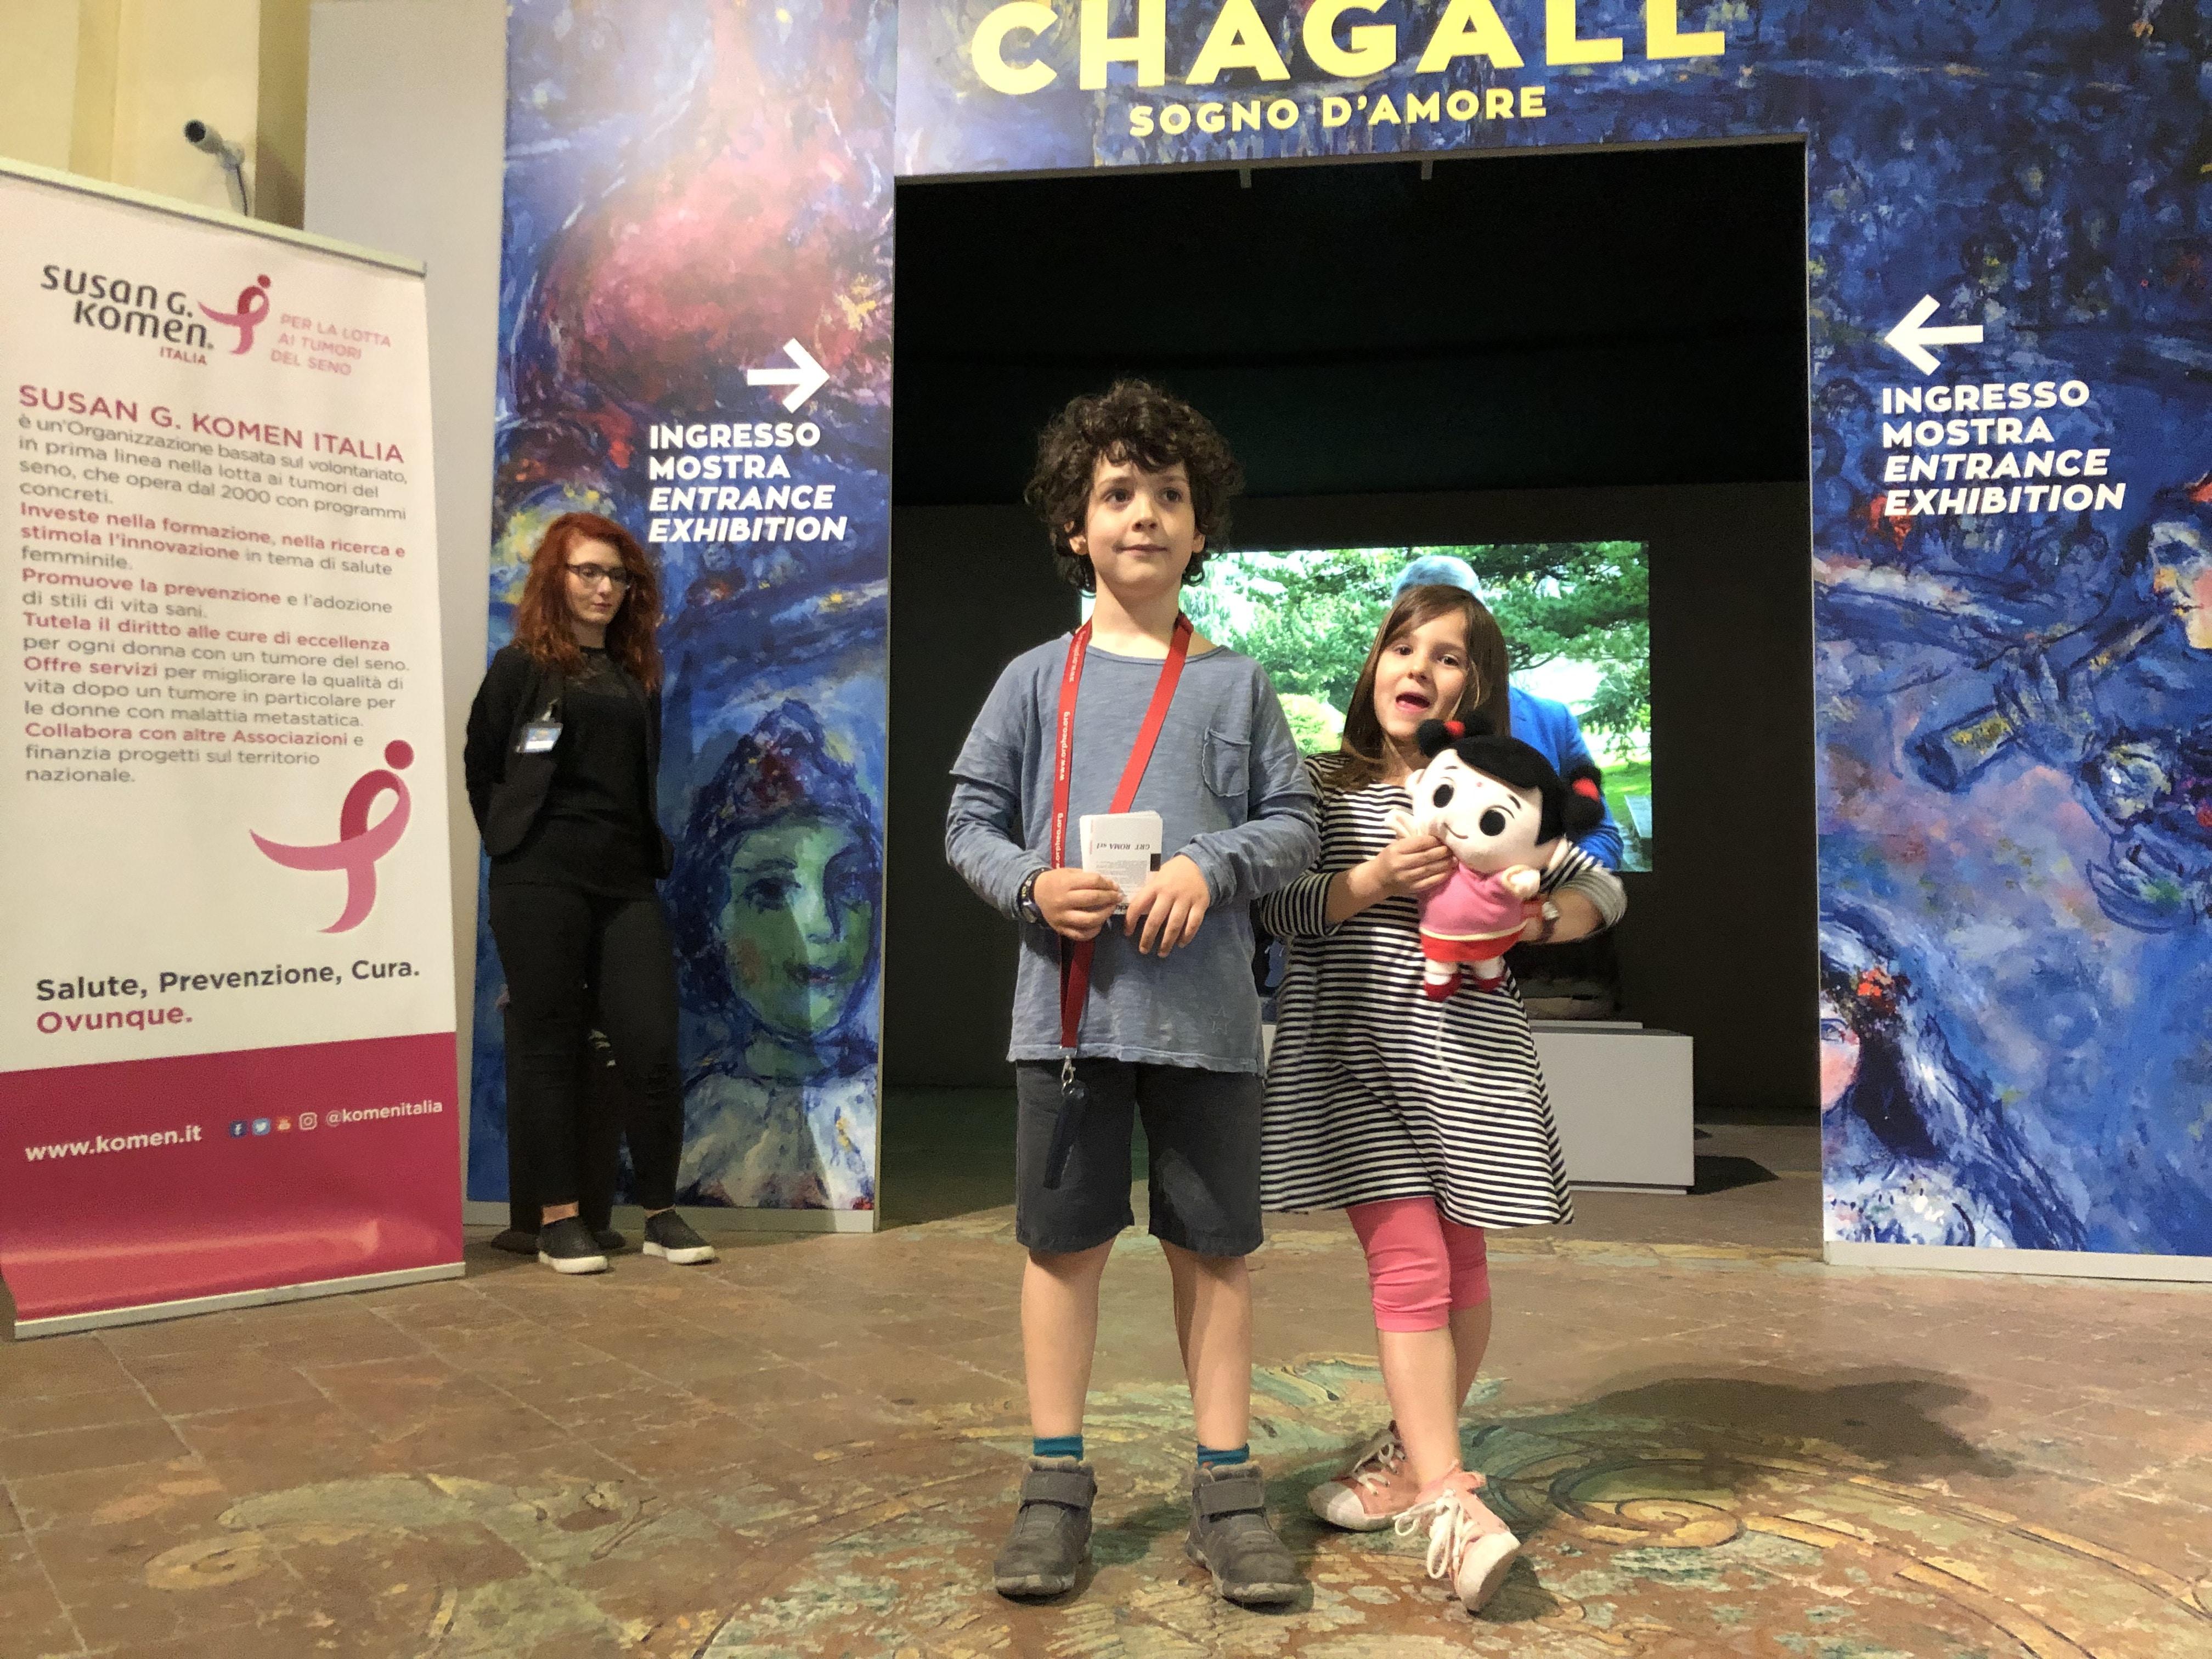 Napoli Chagall